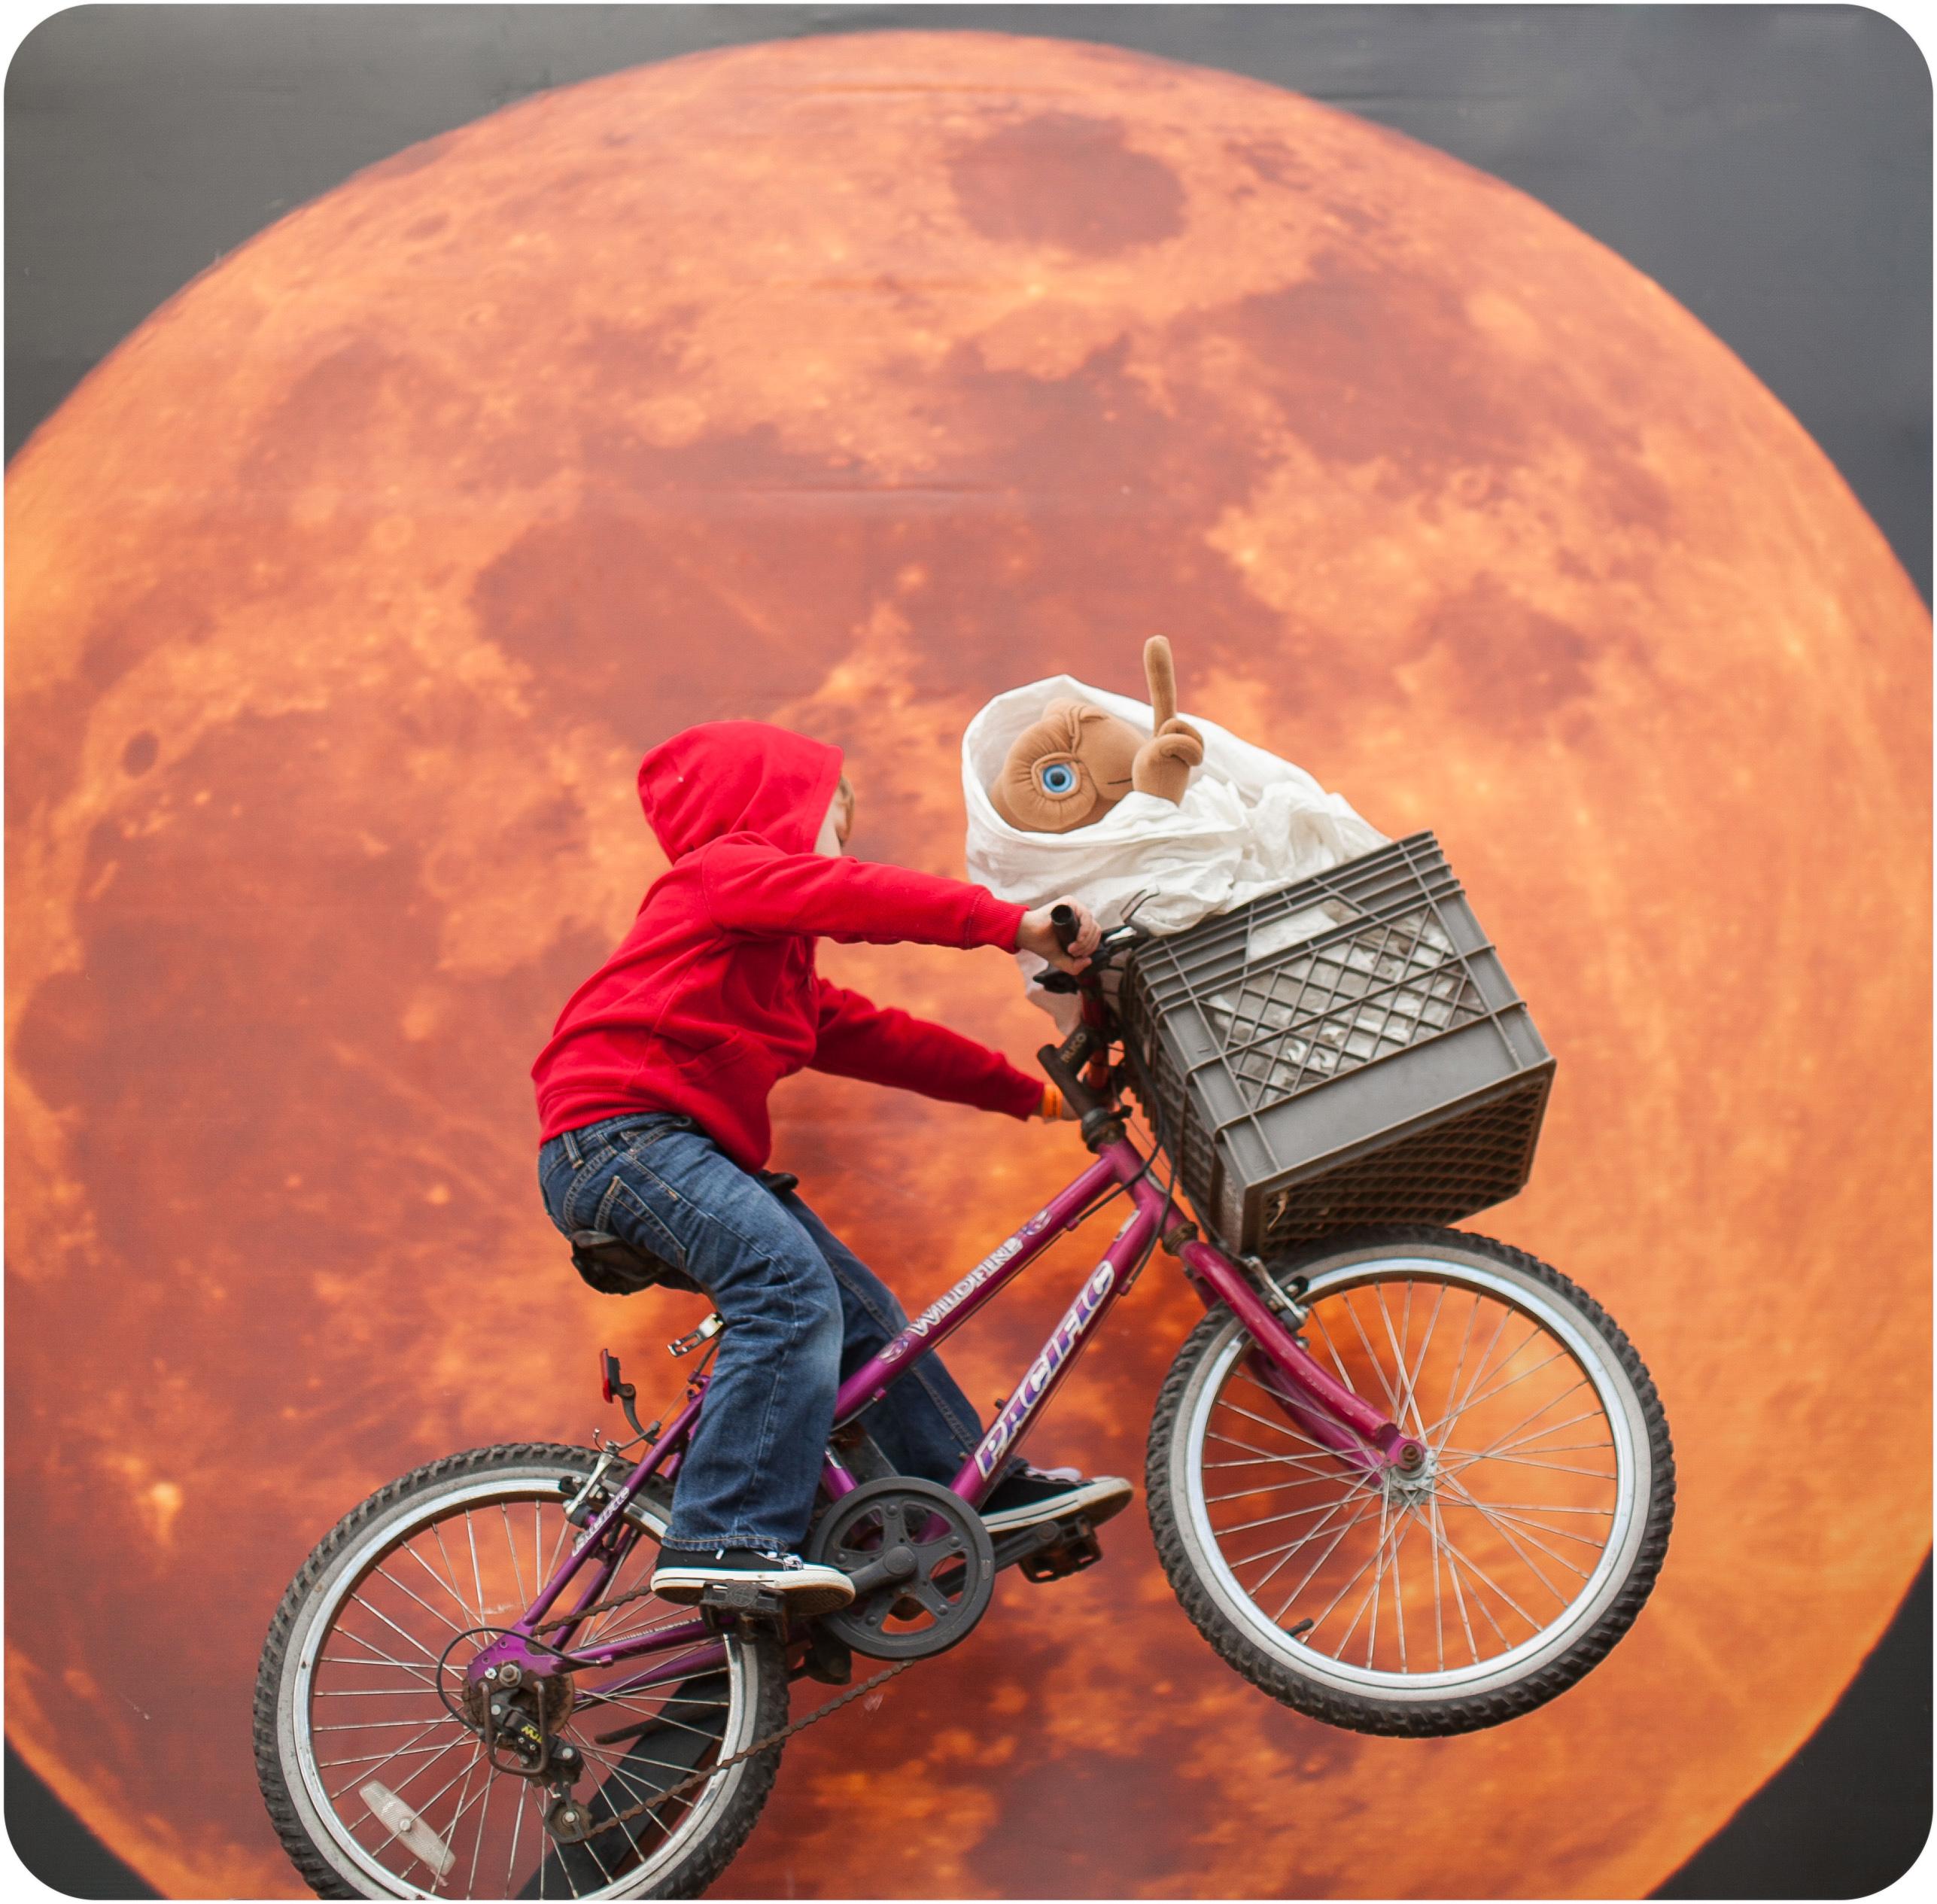 elliot epic moon shot